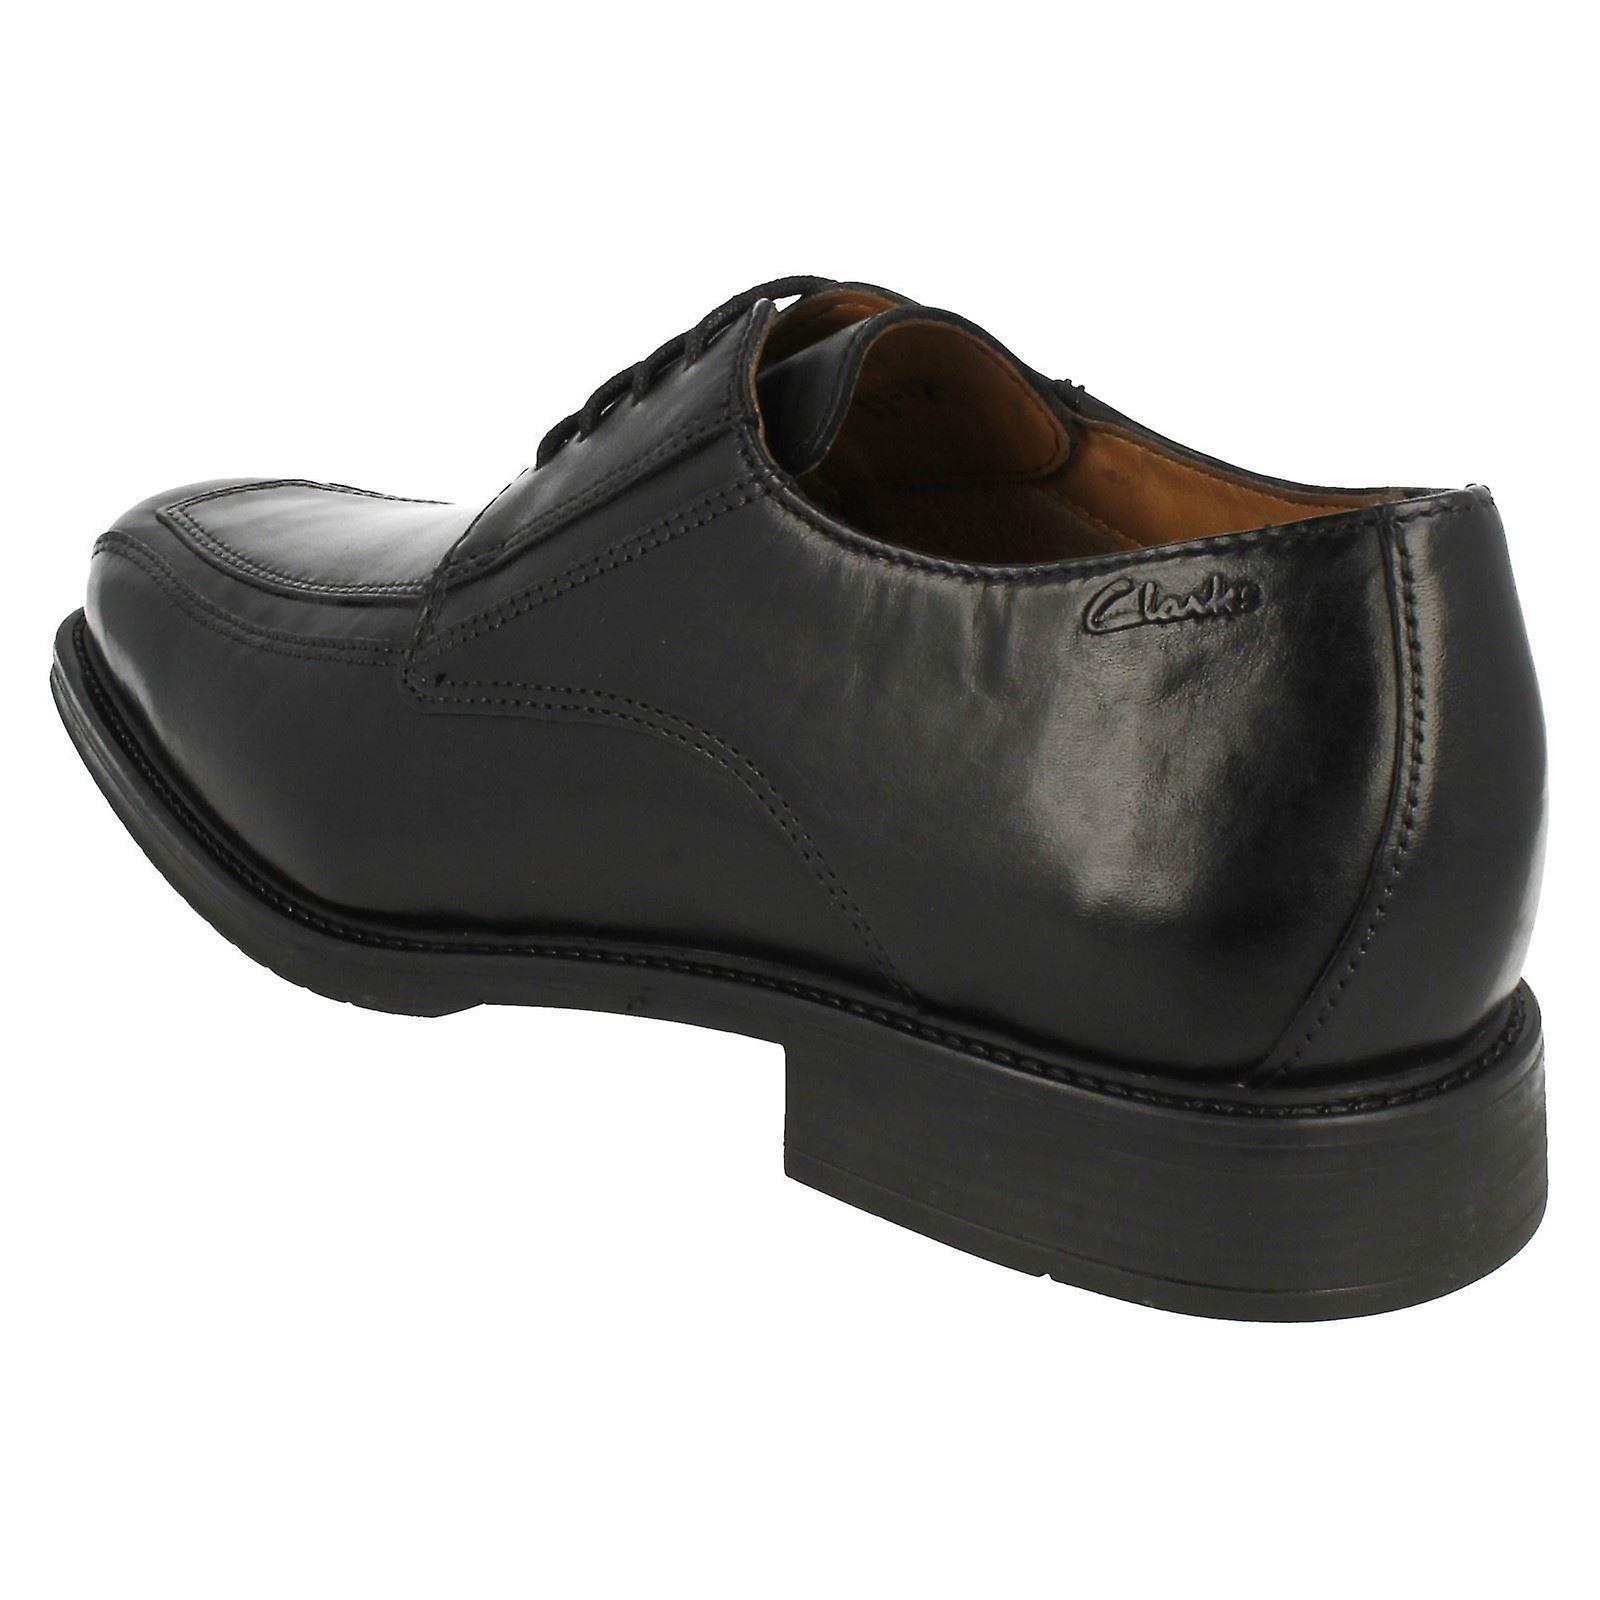 Lacets Mens Clarks chaussures Driggs à pied